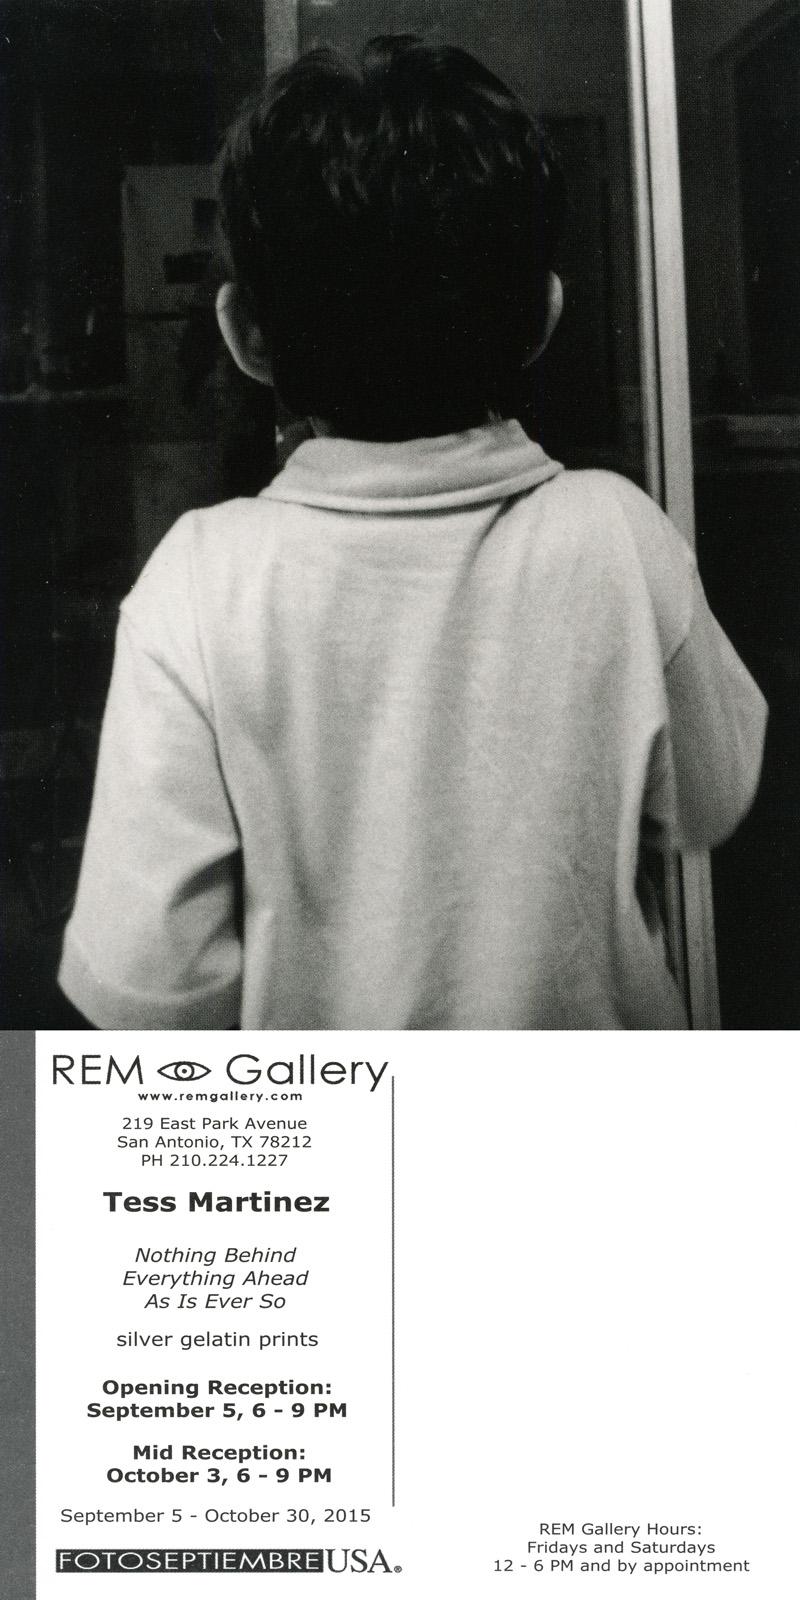 2015-FOTOSEPTIEMBRE-USA_REM-Gallery_Promo-Card